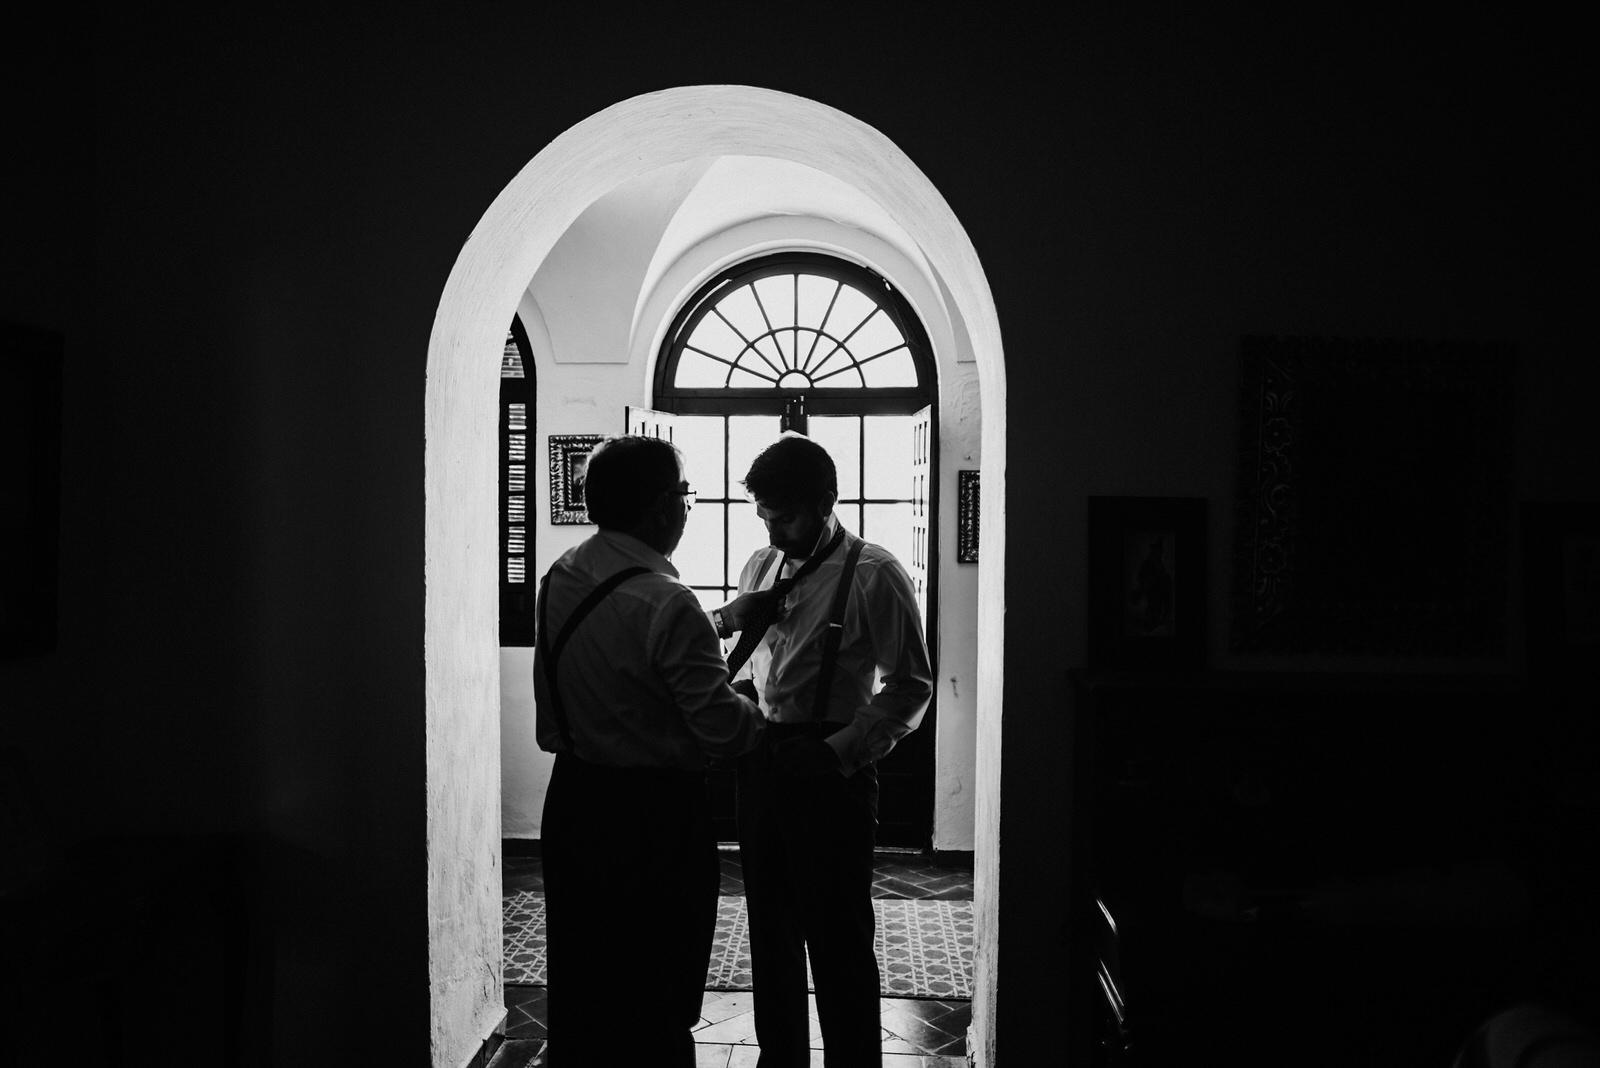 fotografo de bodas sevilla - fotografo boda - fotografía sevilla - Andrés AmarilloAAA_2529- fine.JPG